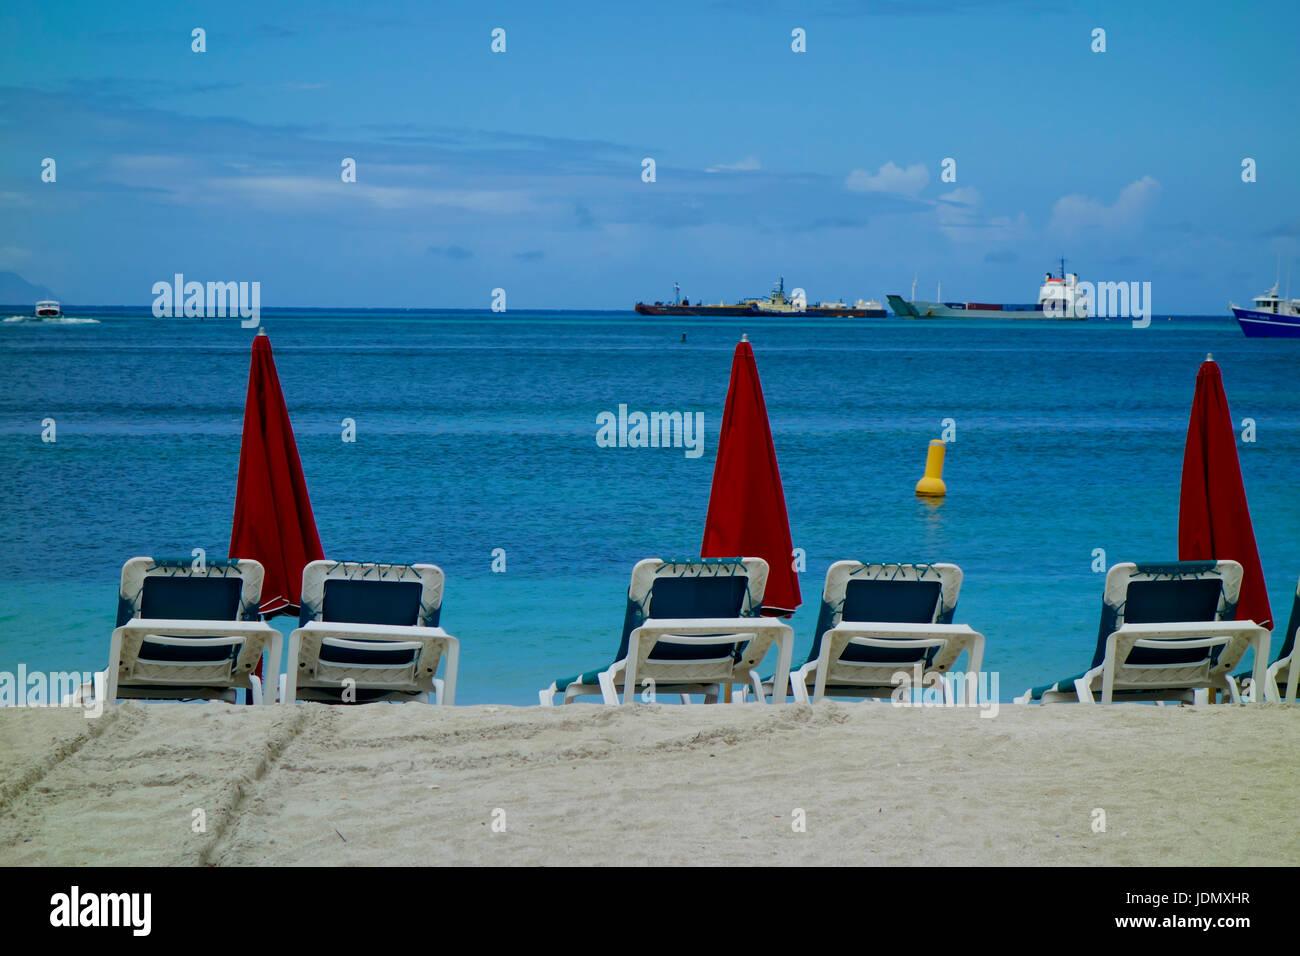 Orient Bay and Beach at Saint Maarten or Saint Martin, Caribbean, West Indies. - Stock Image